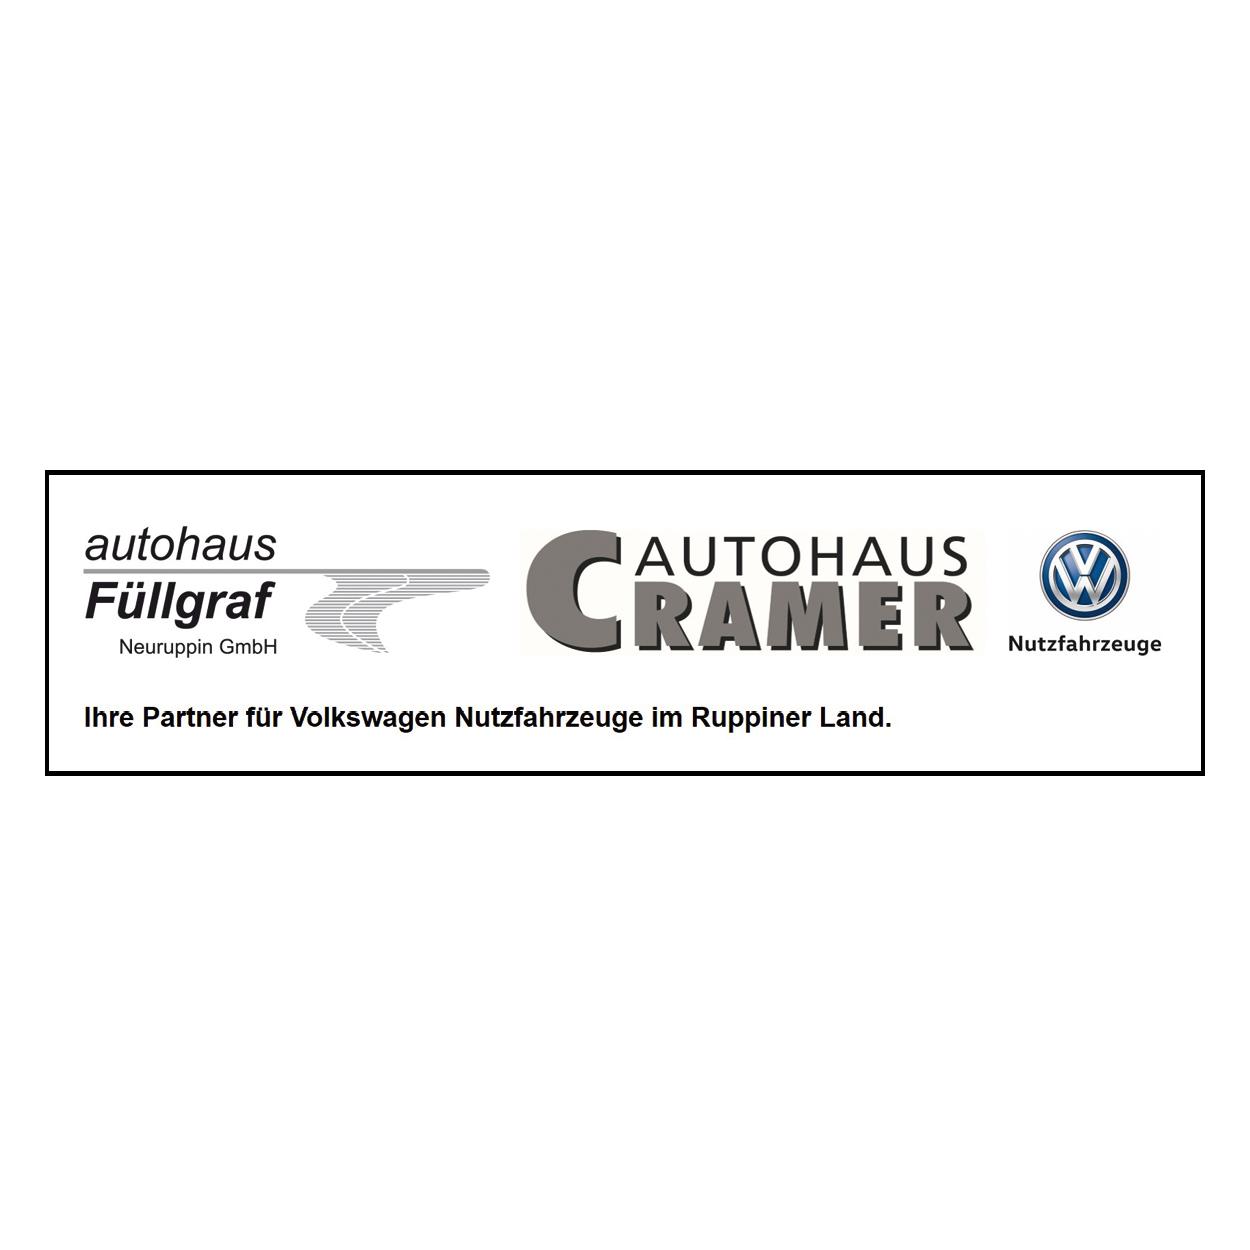 Autohaus Cramer